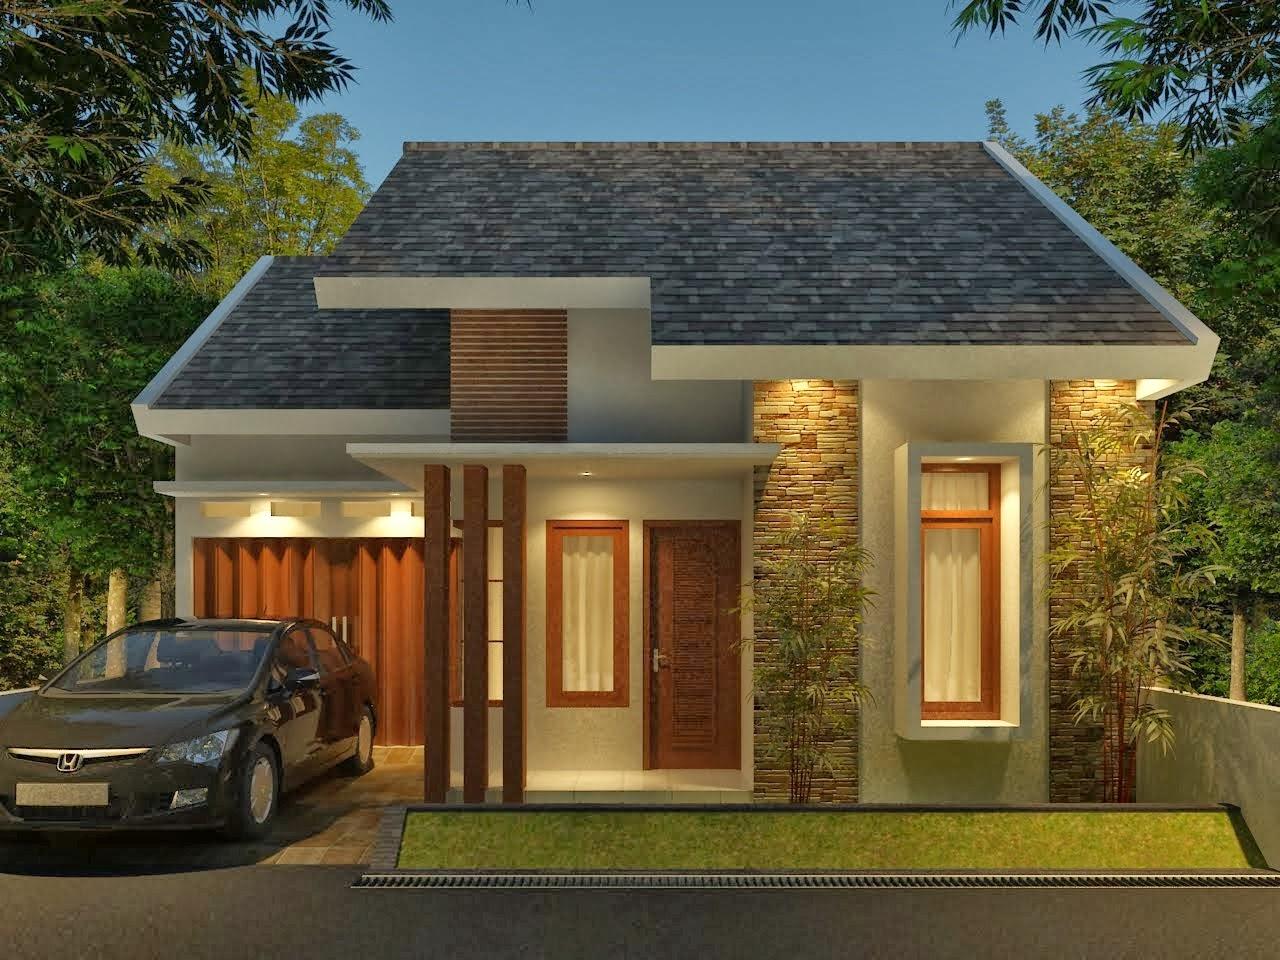 218 Model Rumah Idaman 1 Lantai 3 Kamar Tidur Gambar Rumah Idaman